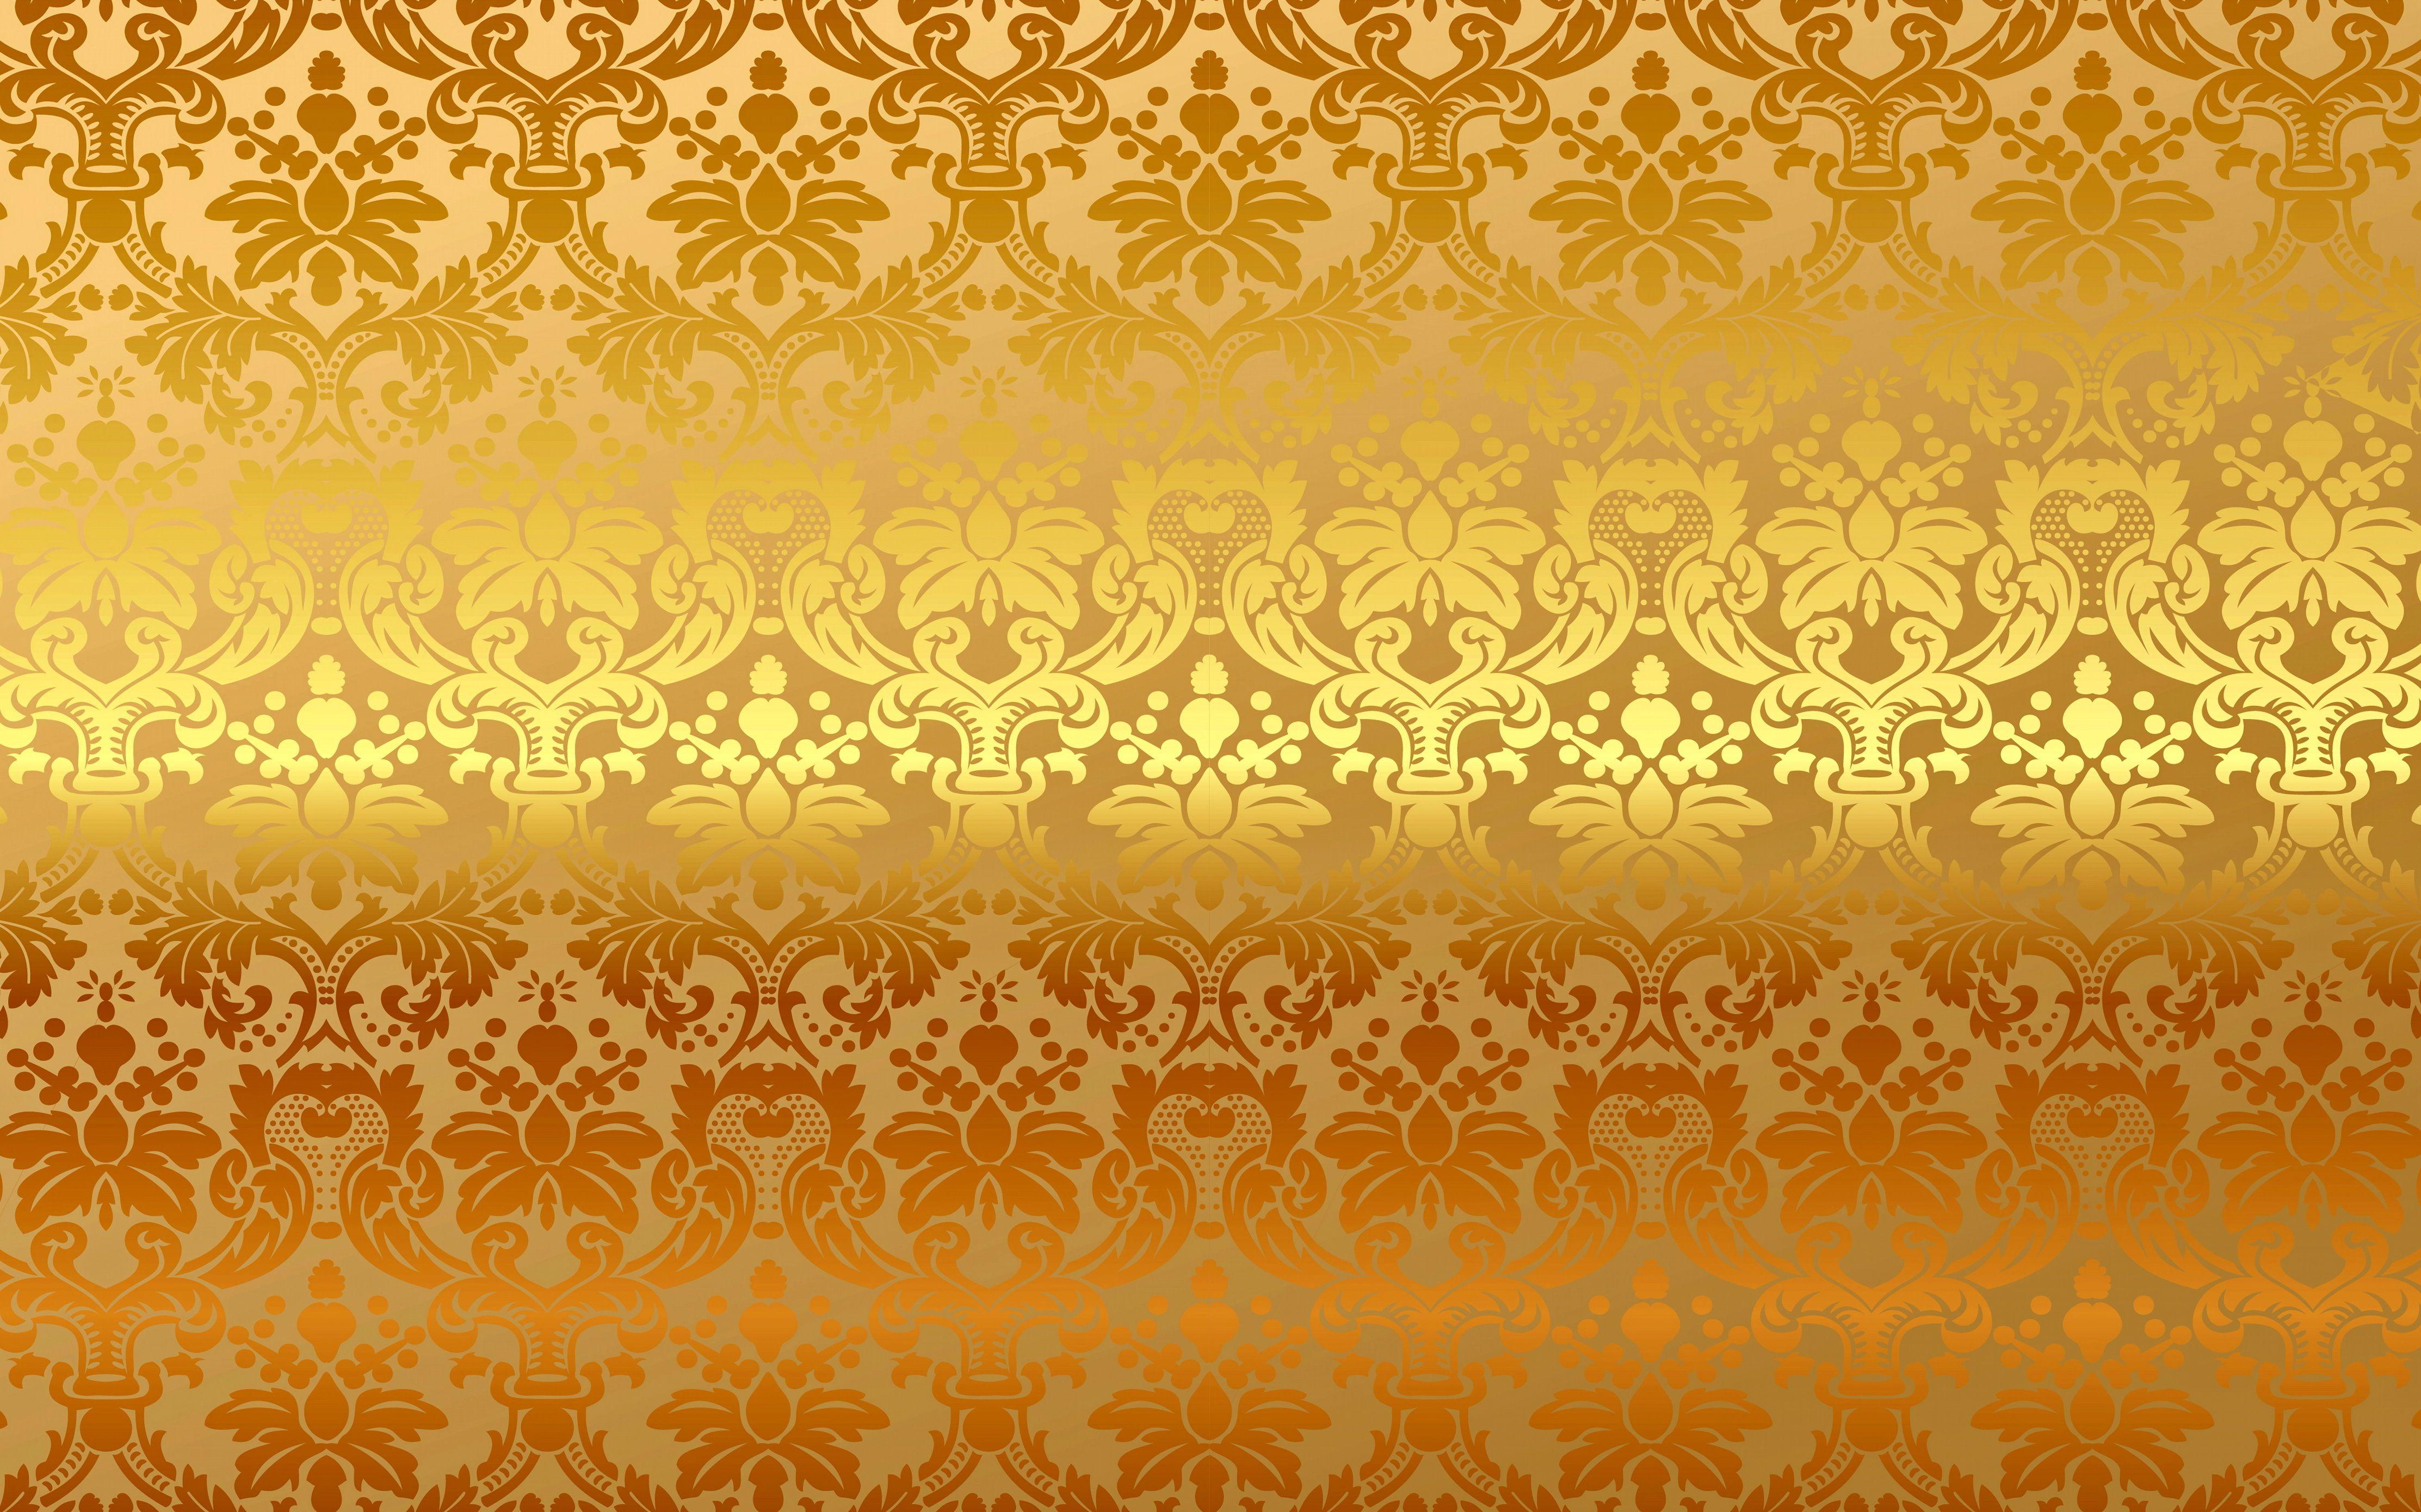 Download Wallpaper Pattern Vintage Background Vector Gold Background Gradient Ornament Pattern Floral Wallpaper Golden Wallpaper Vintage Gold Wallpaper